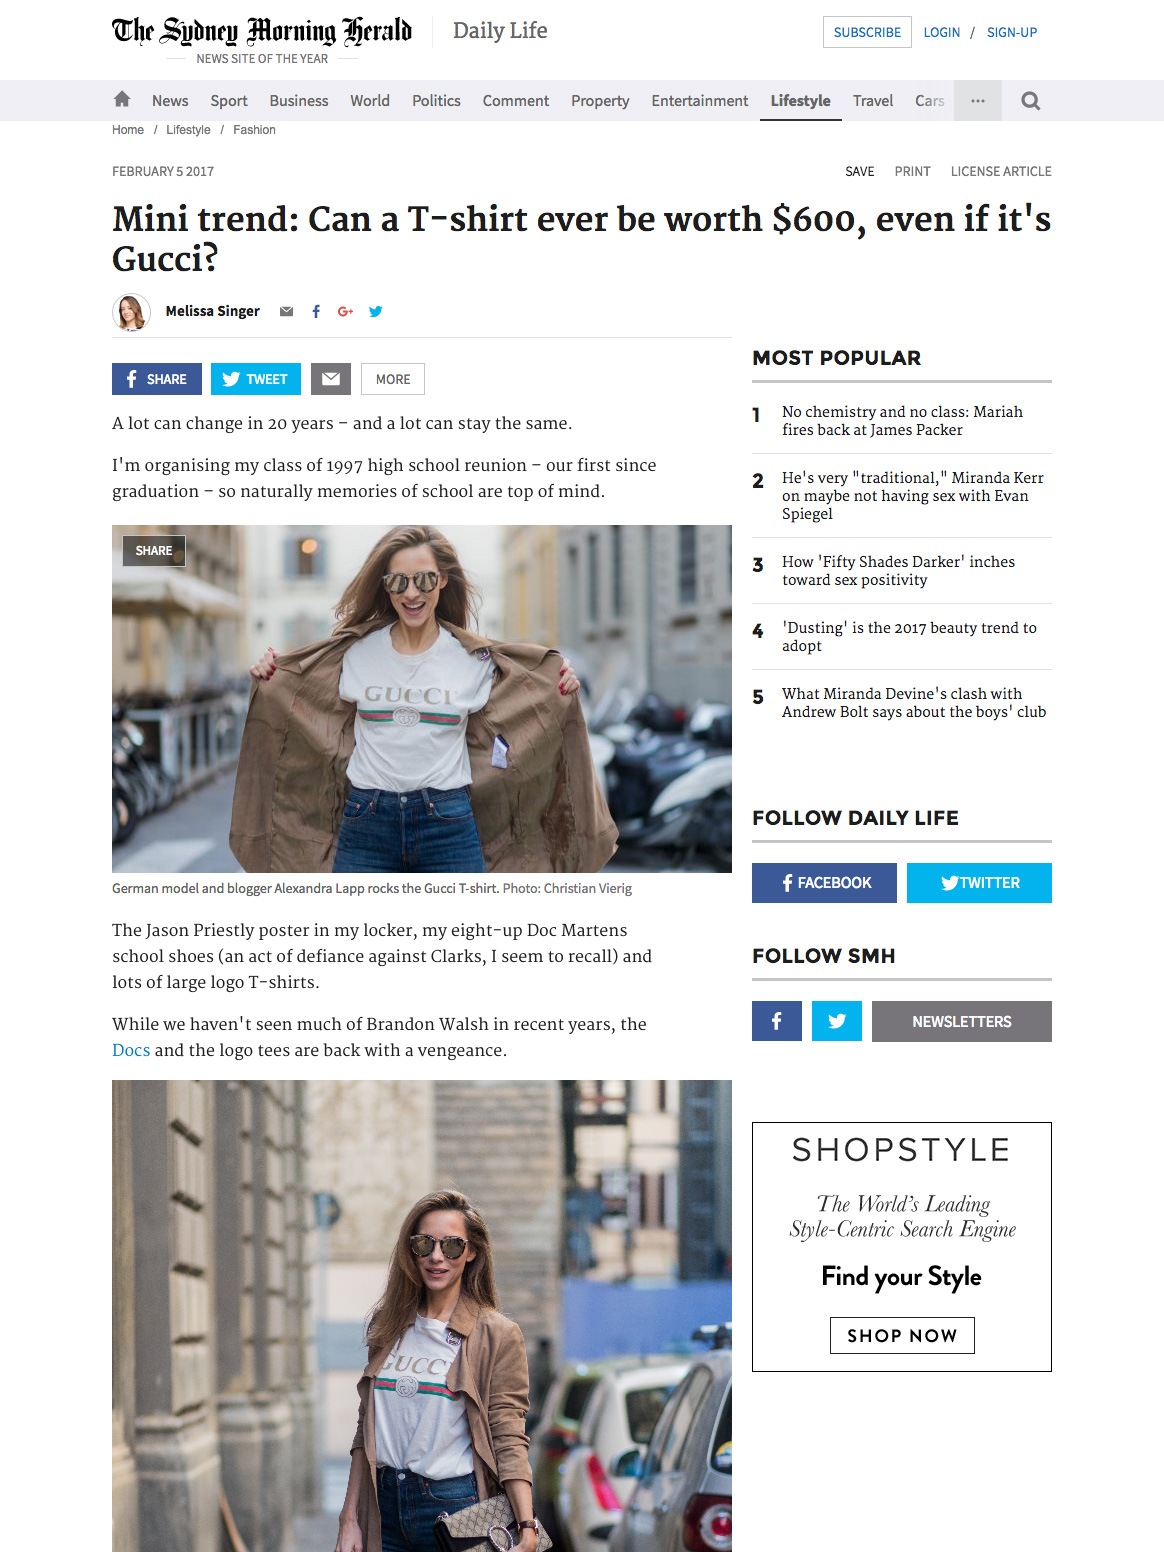 Alexandra Lapp Street Style - Found on http://www.smh.com.au/lifestyle/fashion/mini-trend-can-a-tshirt-be-worth-600--even-if-its-gucci-20170126-gtz50c.html